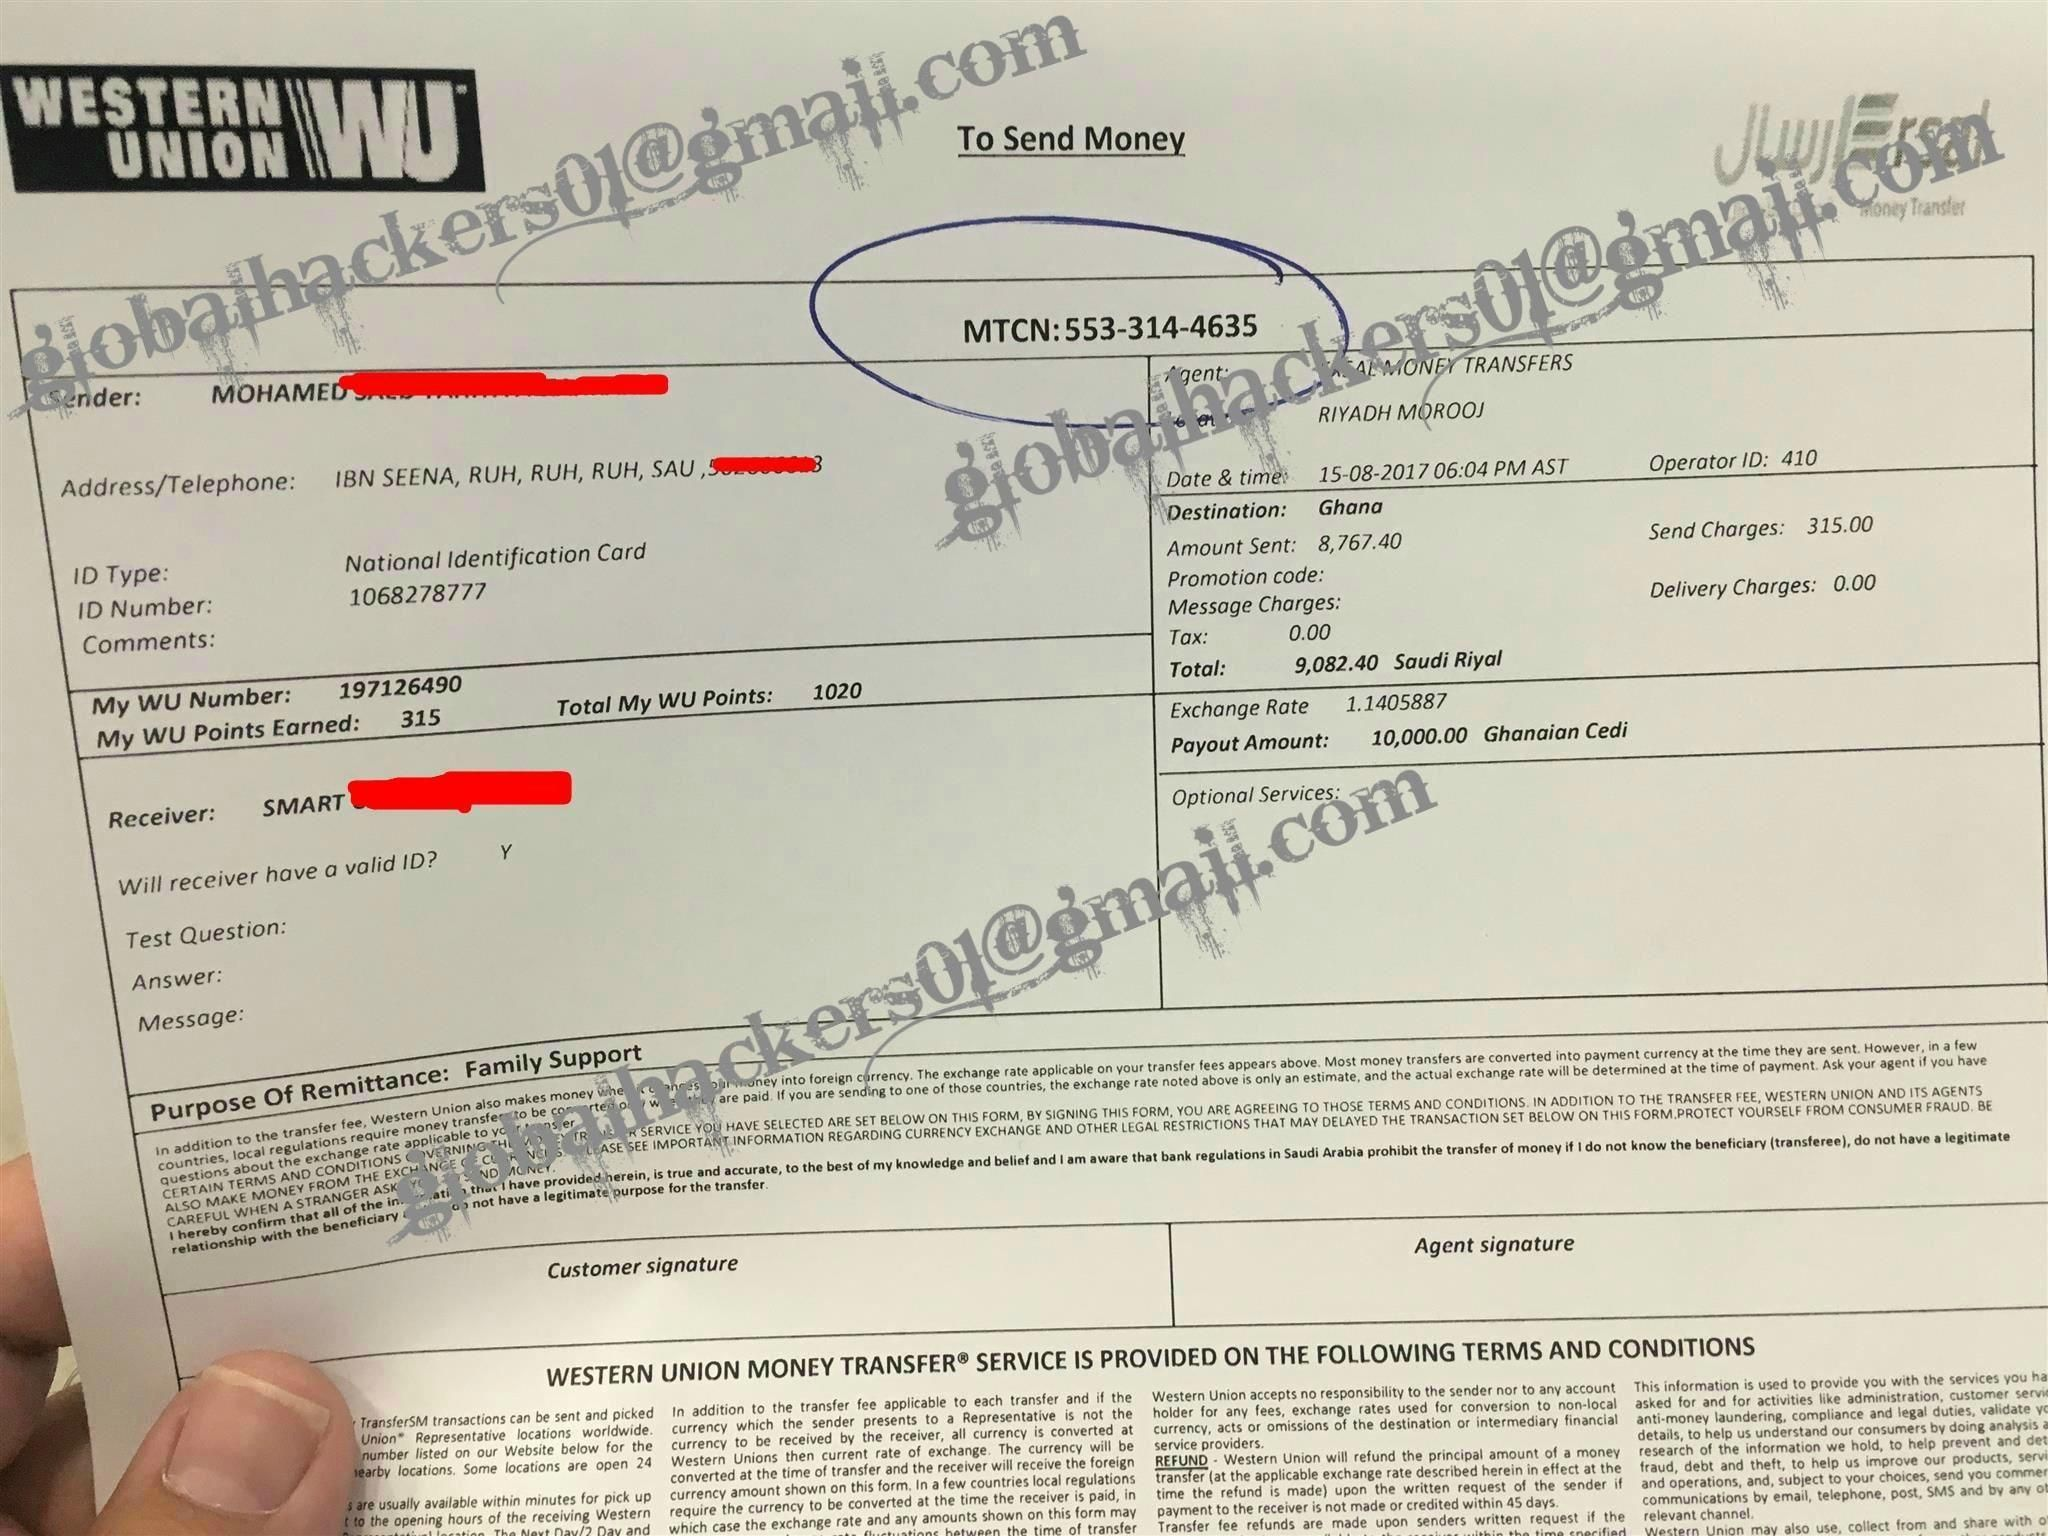 sample receipt of western union money transfer  Banking | Western union money transfer, Western union ...